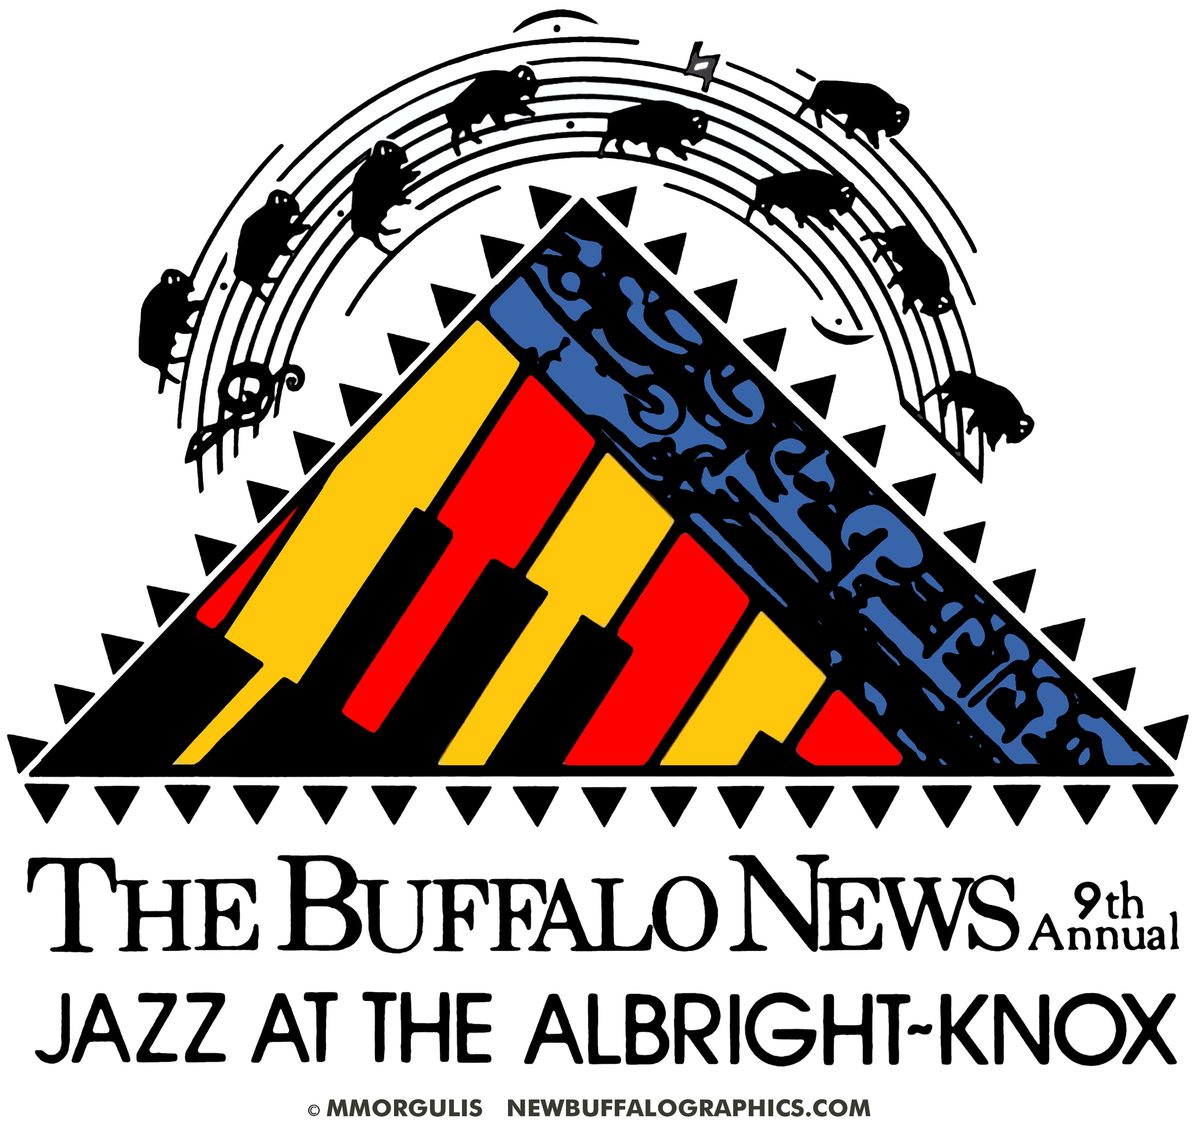 Buffalo News Jazz @ Albright Knox #9 (large view)